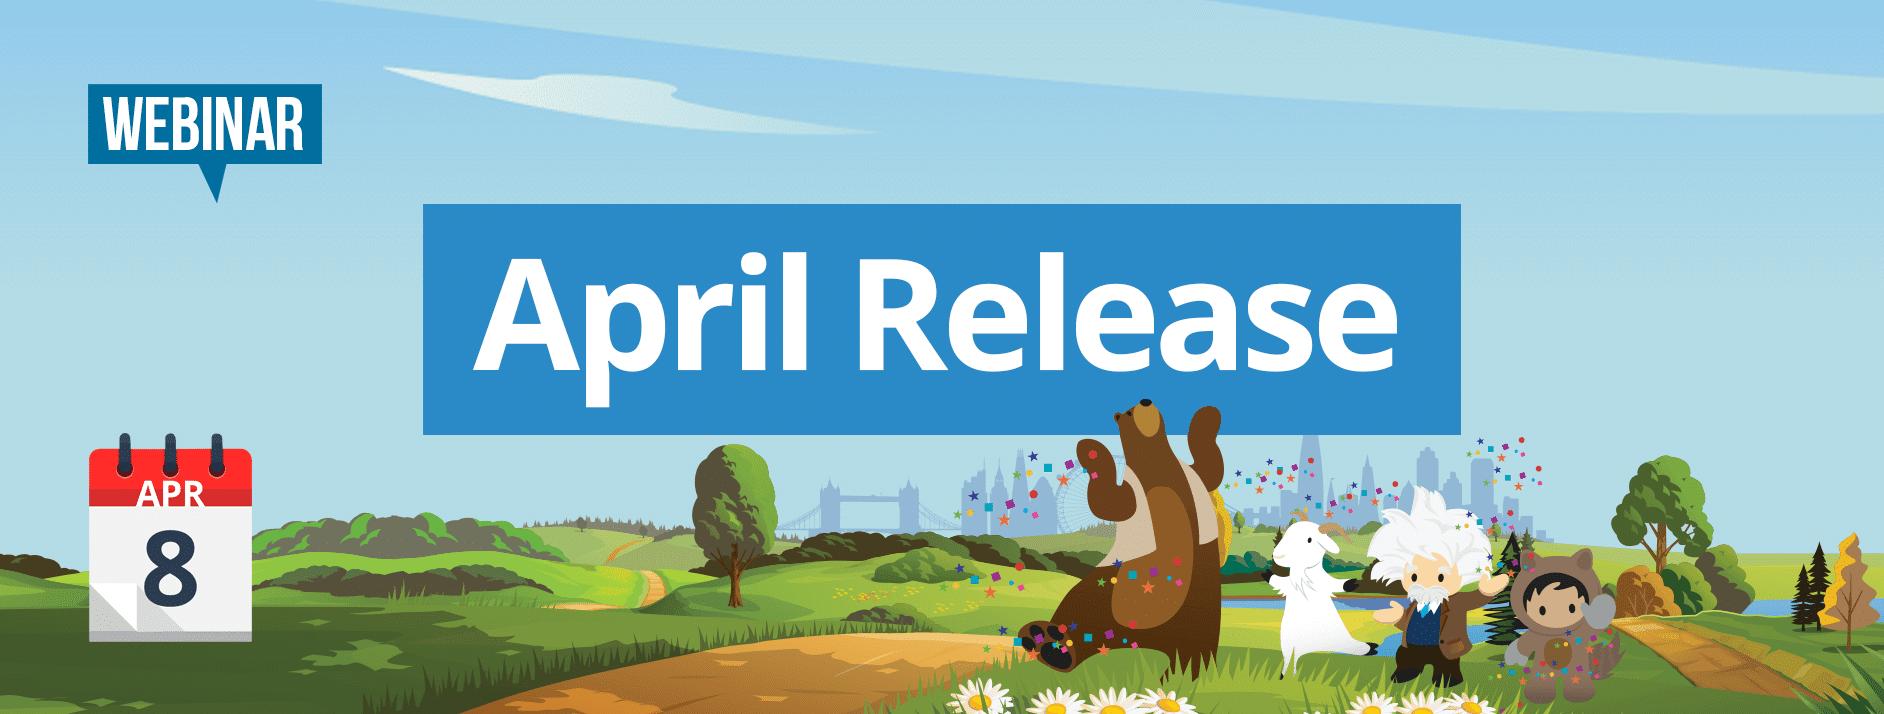 Release webinar April Netive VMS